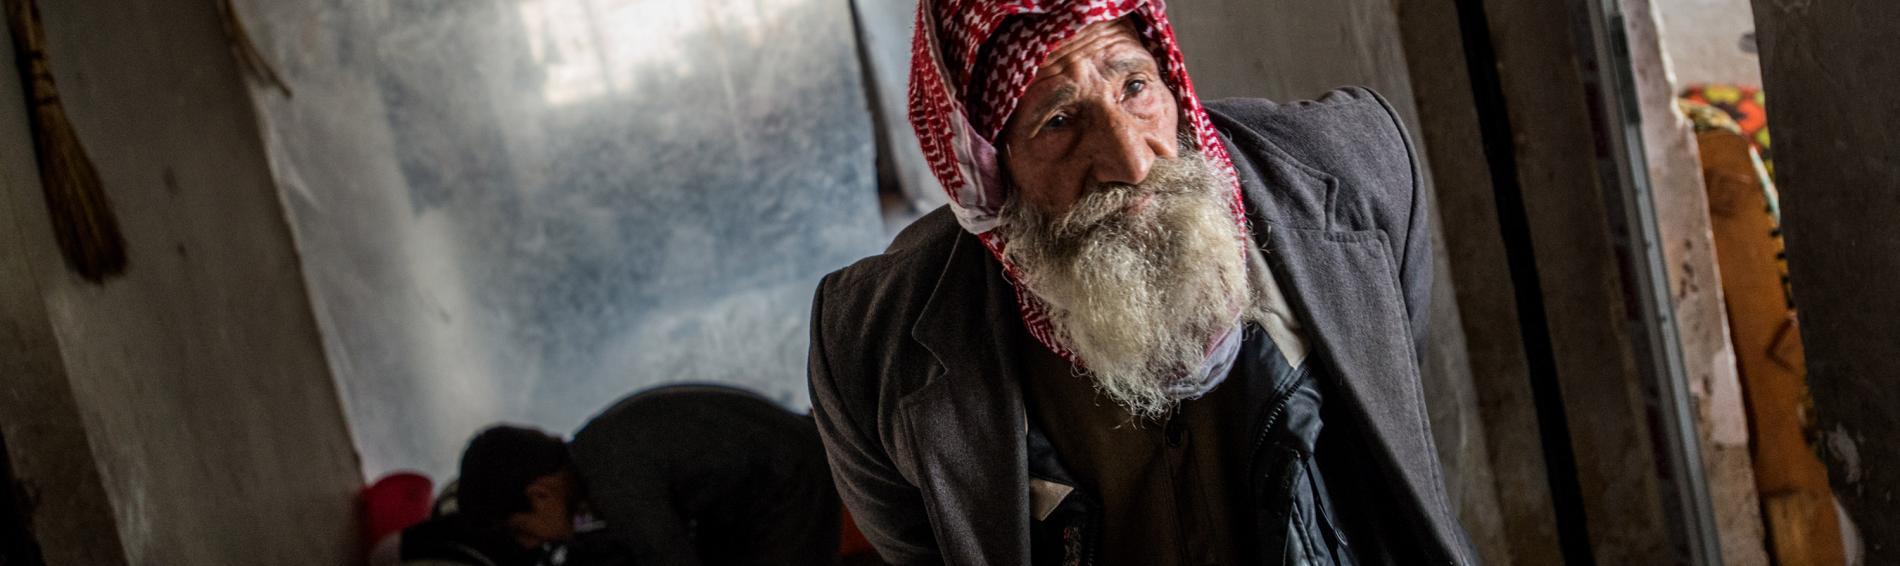 Ein älterer Bewohner im Dorf Bamerni, Distrikt Amedi. Foto: Guillaume Pinon